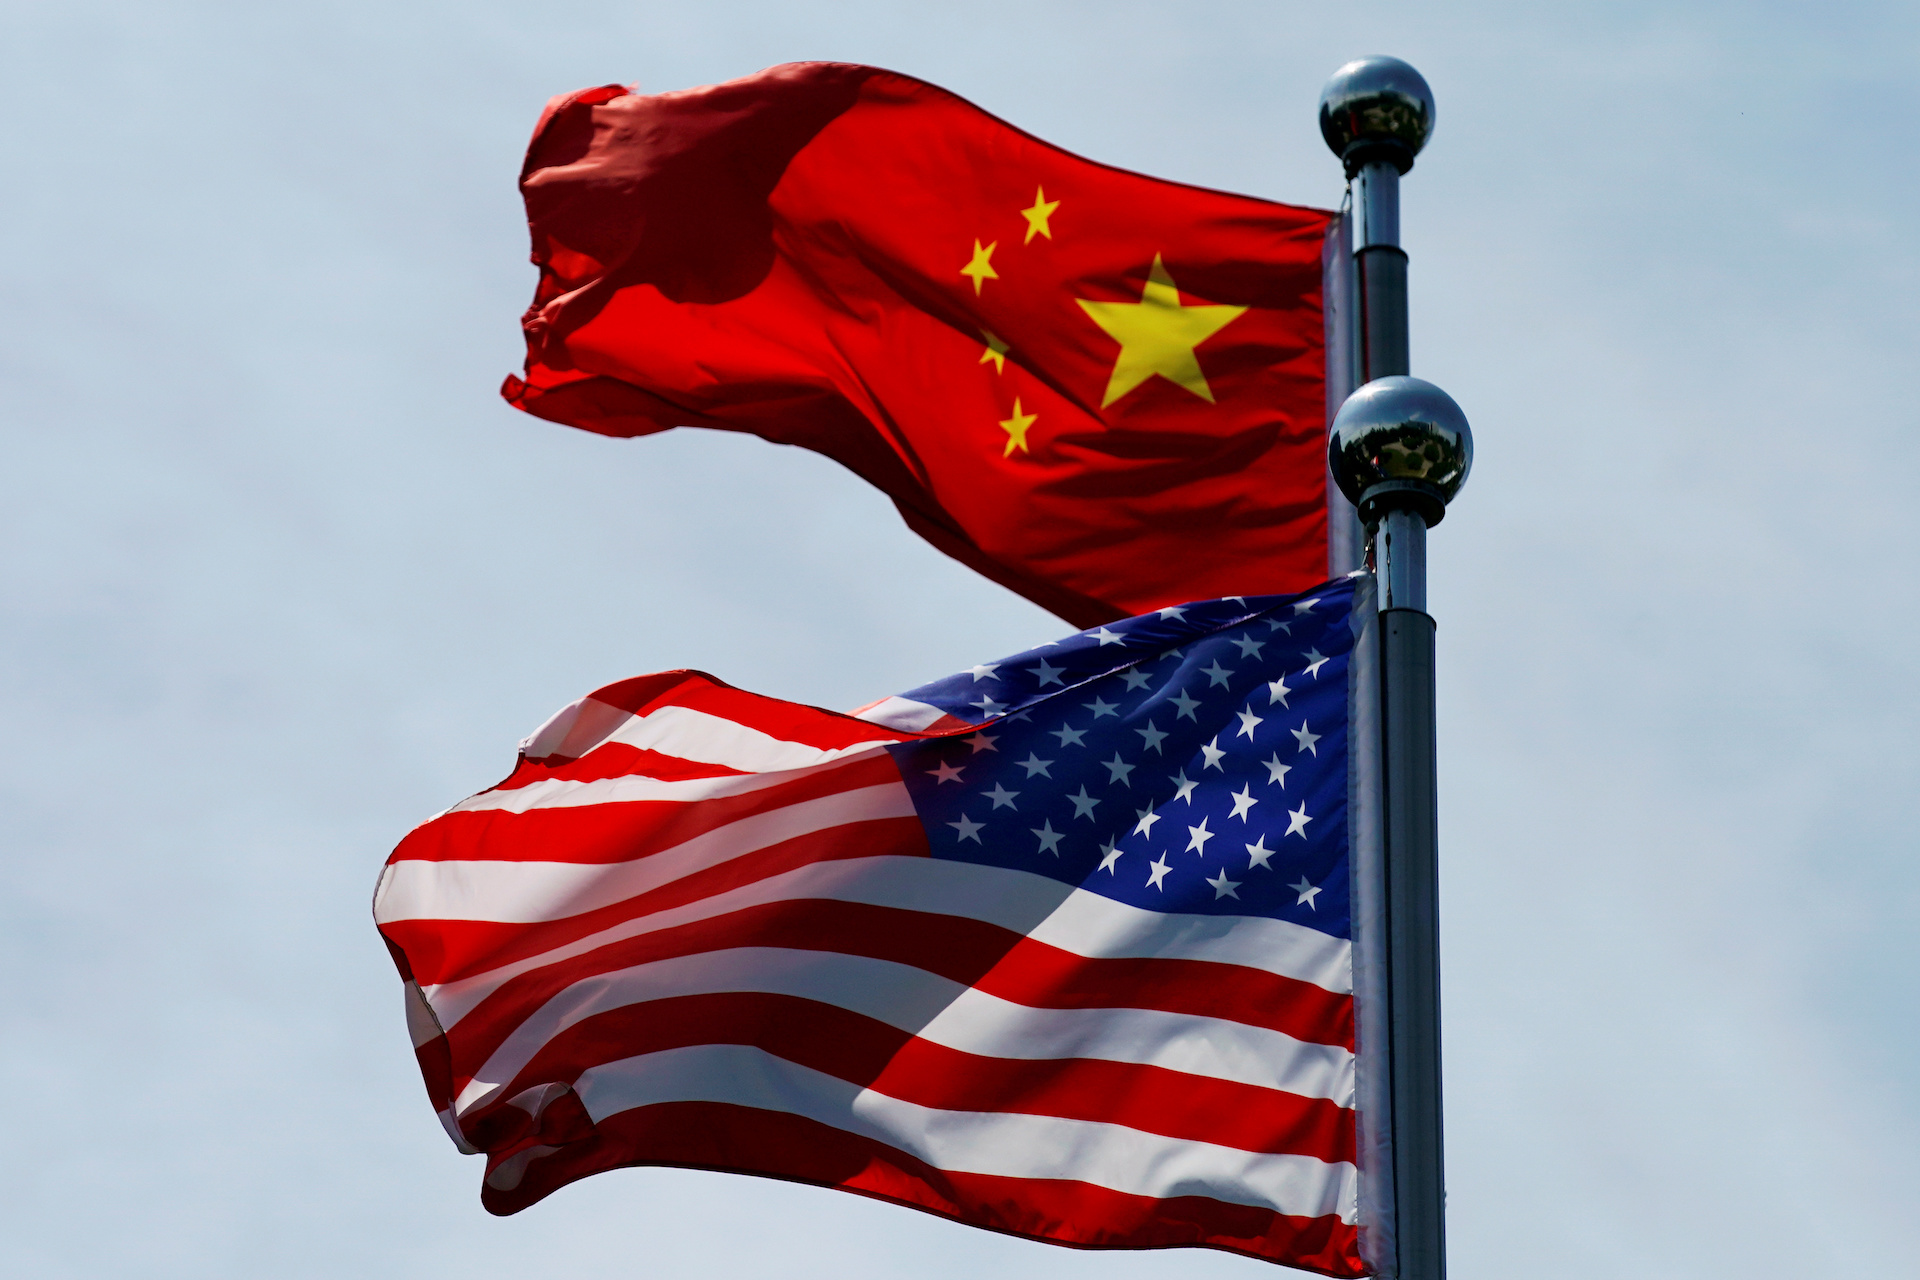 'Dialogue key to China-US ties'